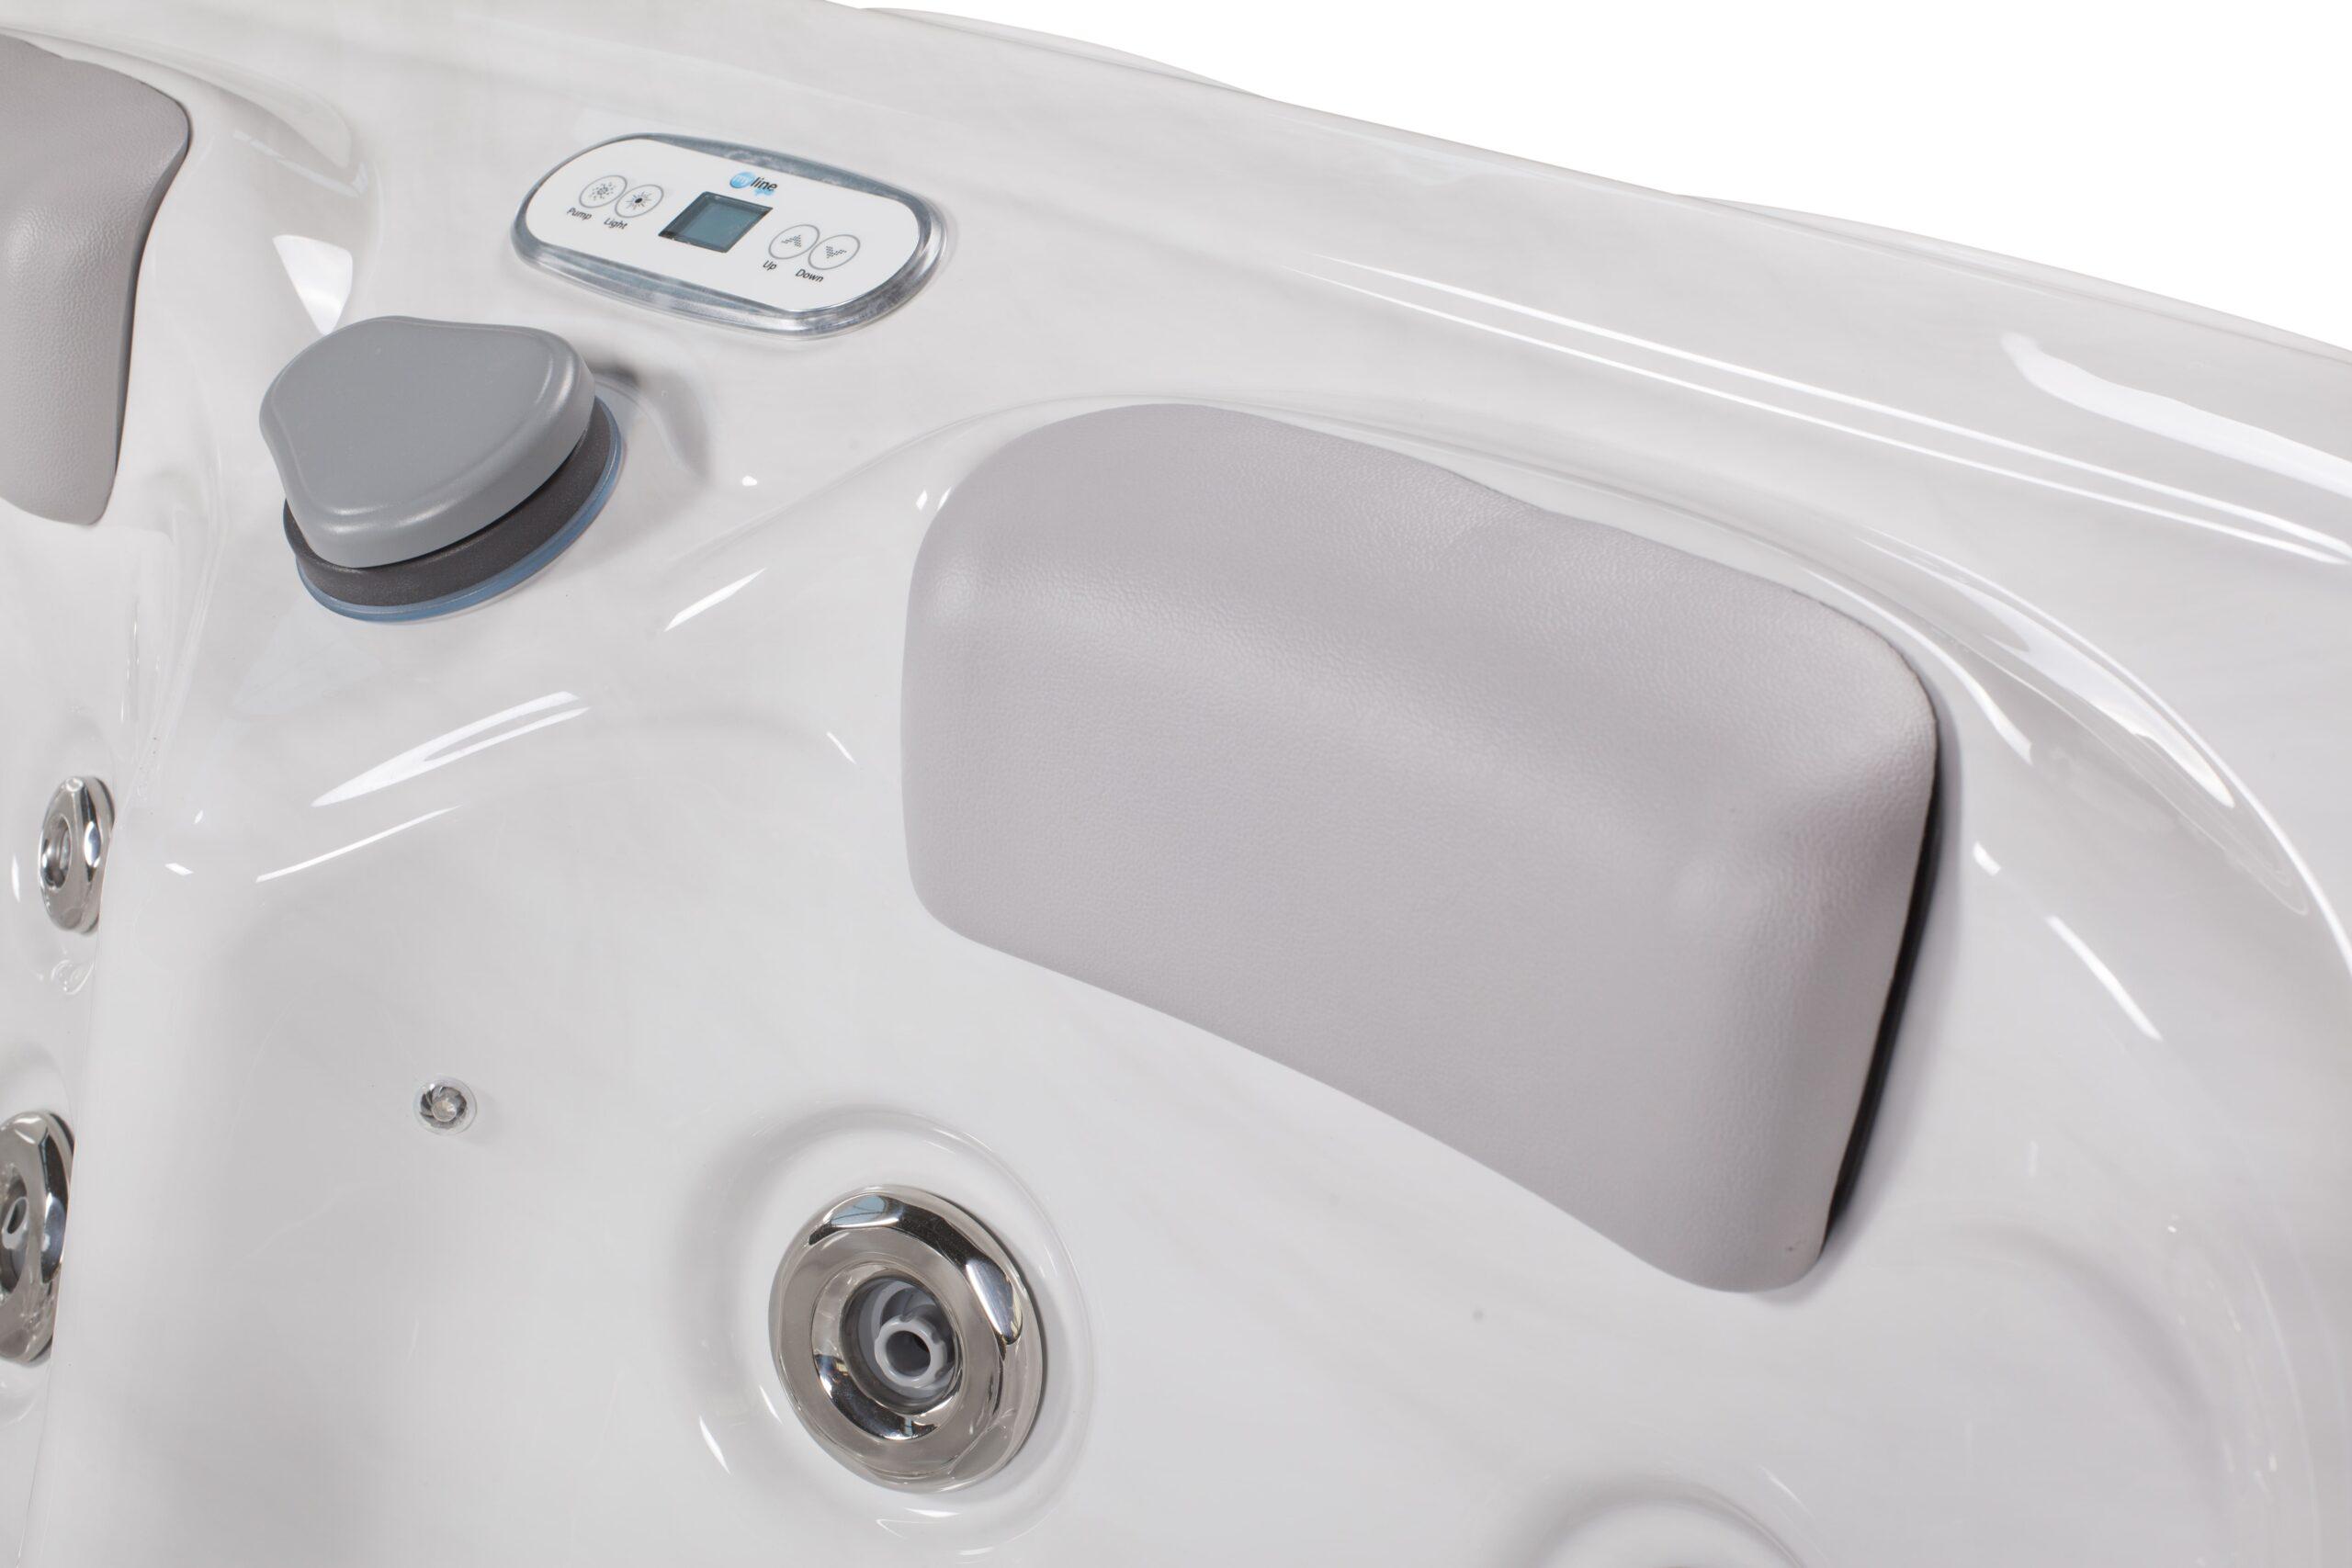 Luxury hot tub seating